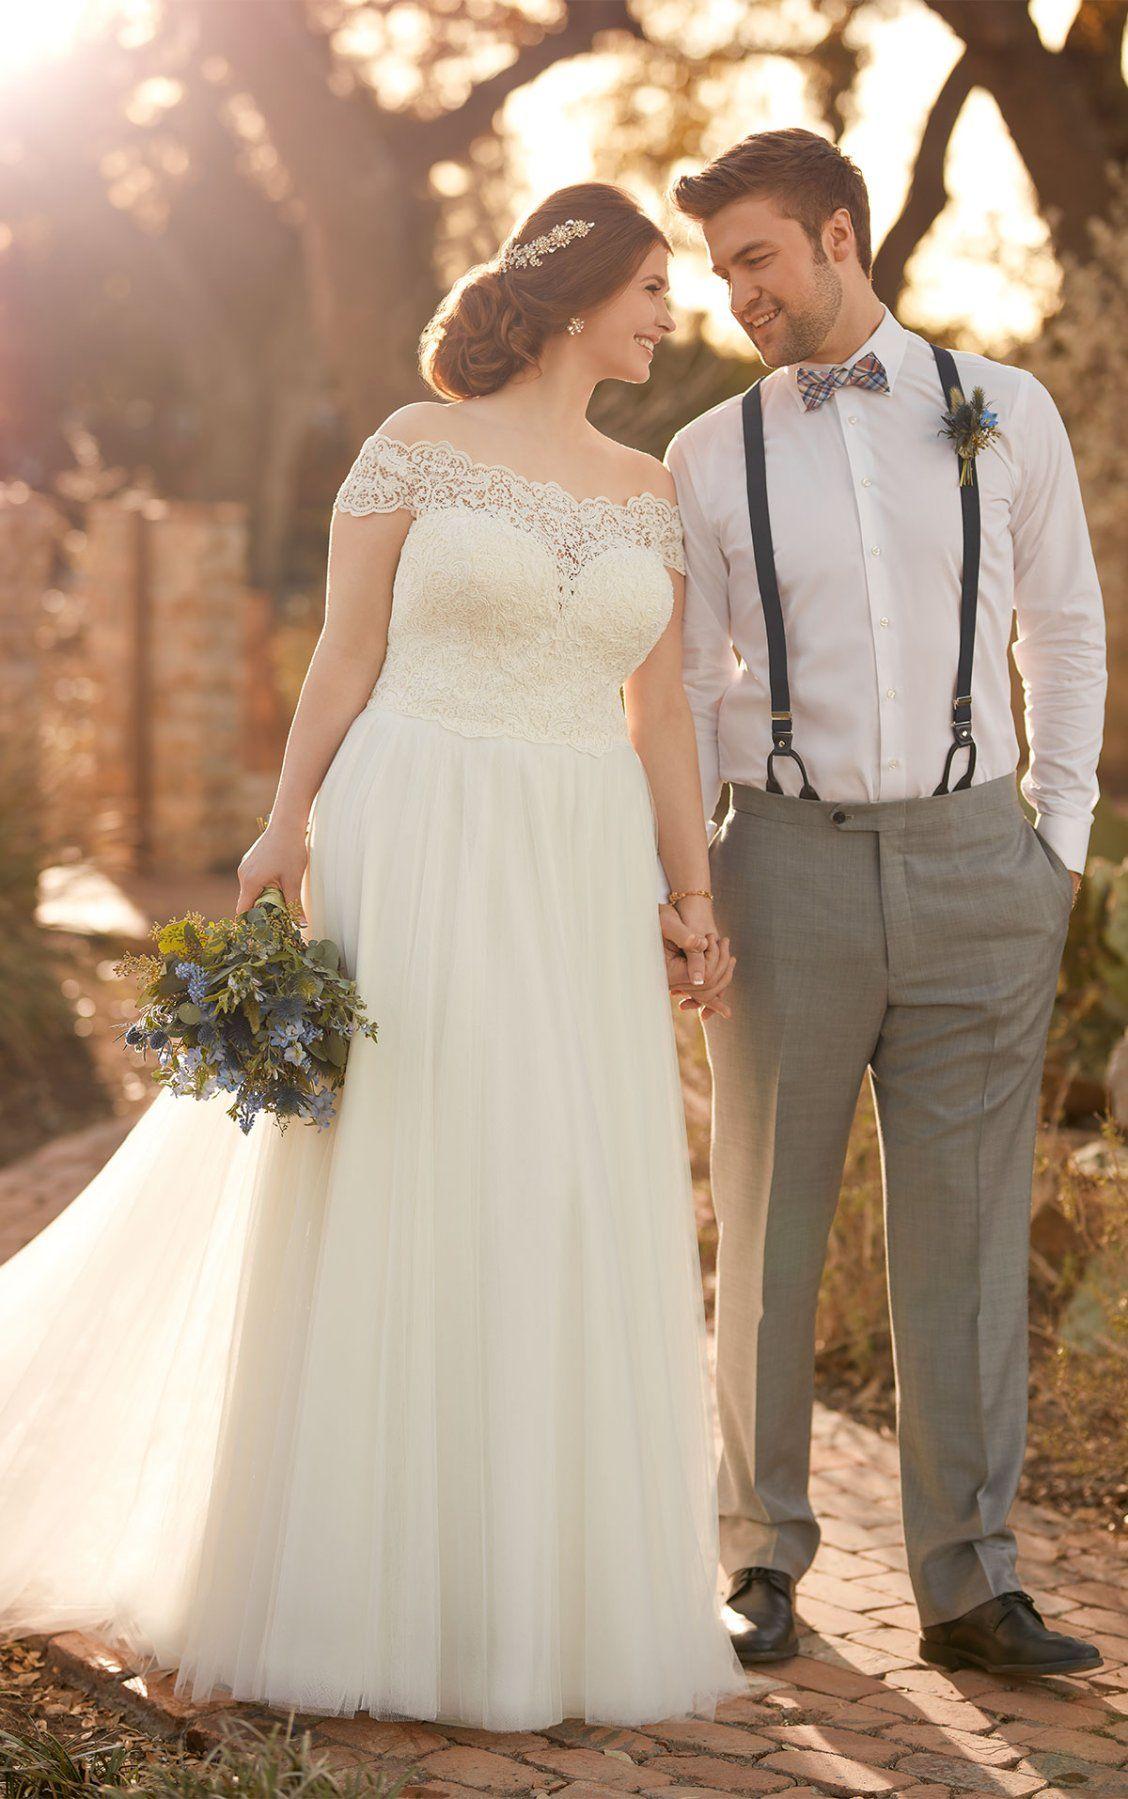 Breezy Beach Wedding Dress in 2020 Essense of australia